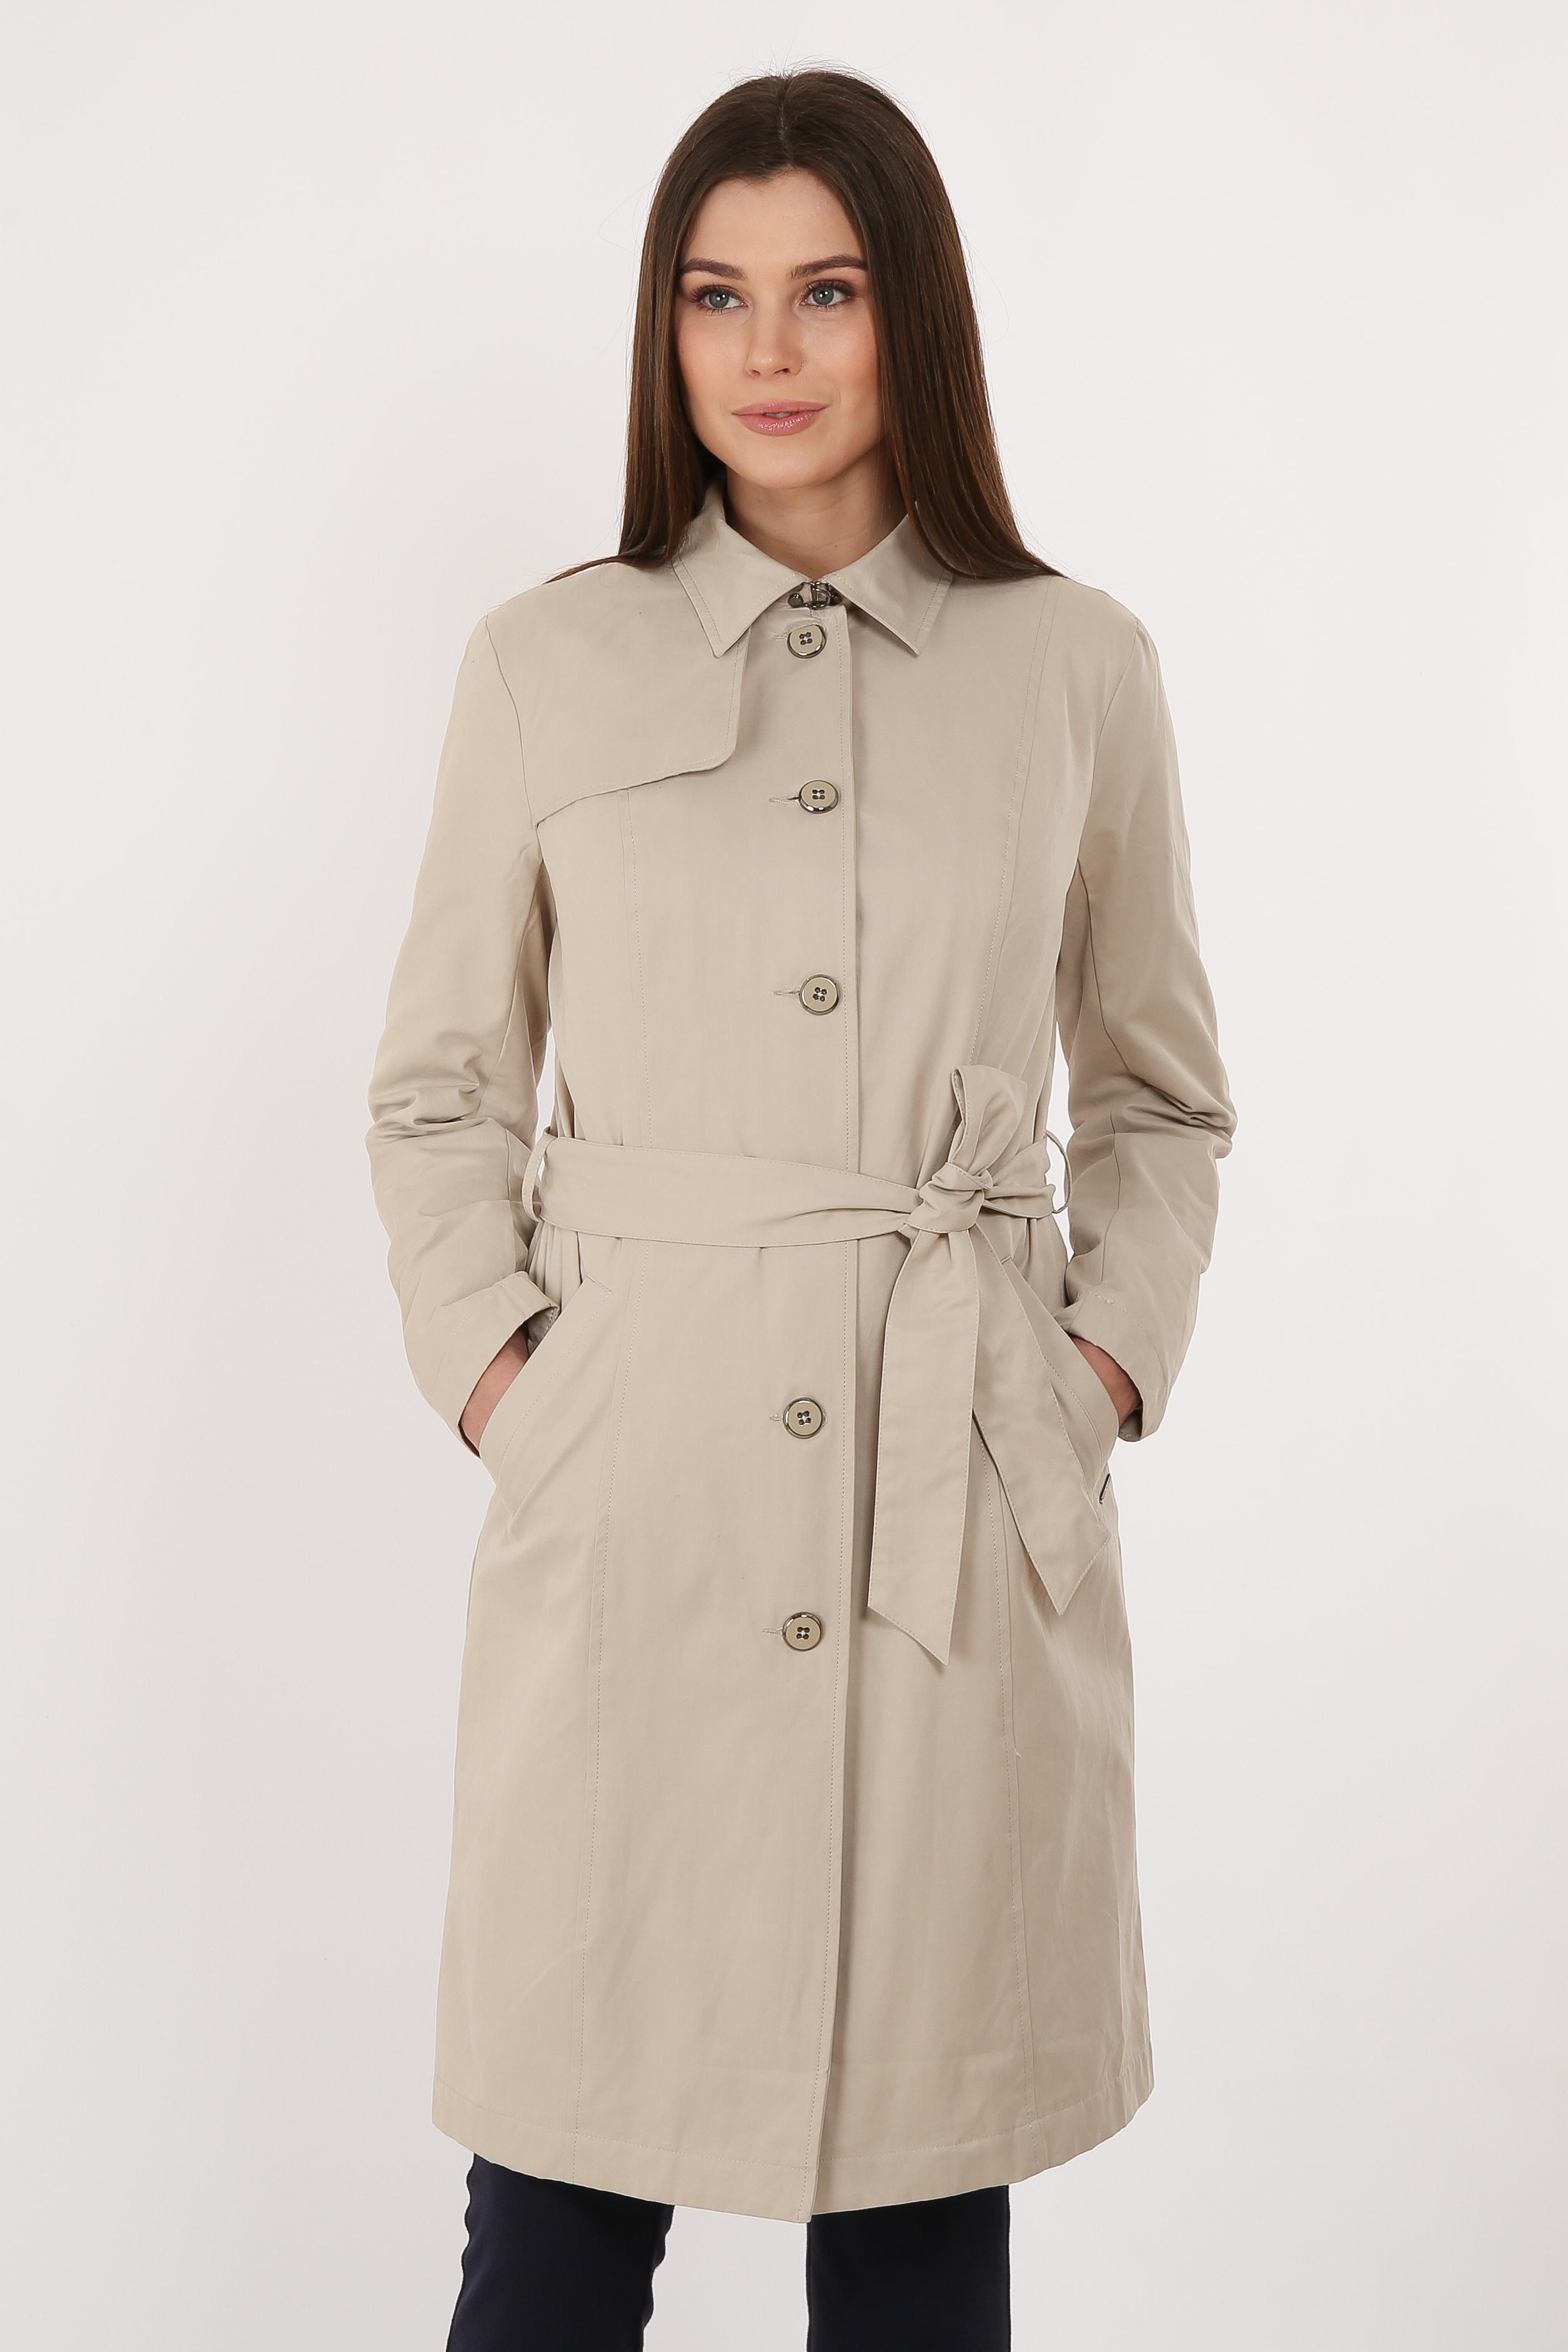 Finn Flare Trenchcoat mit elegantem Gürtel | Bekleidung > Mäntel > Trenchcoats | Braun | Baumwolle - Jeans - Nylon | FINN FLARE